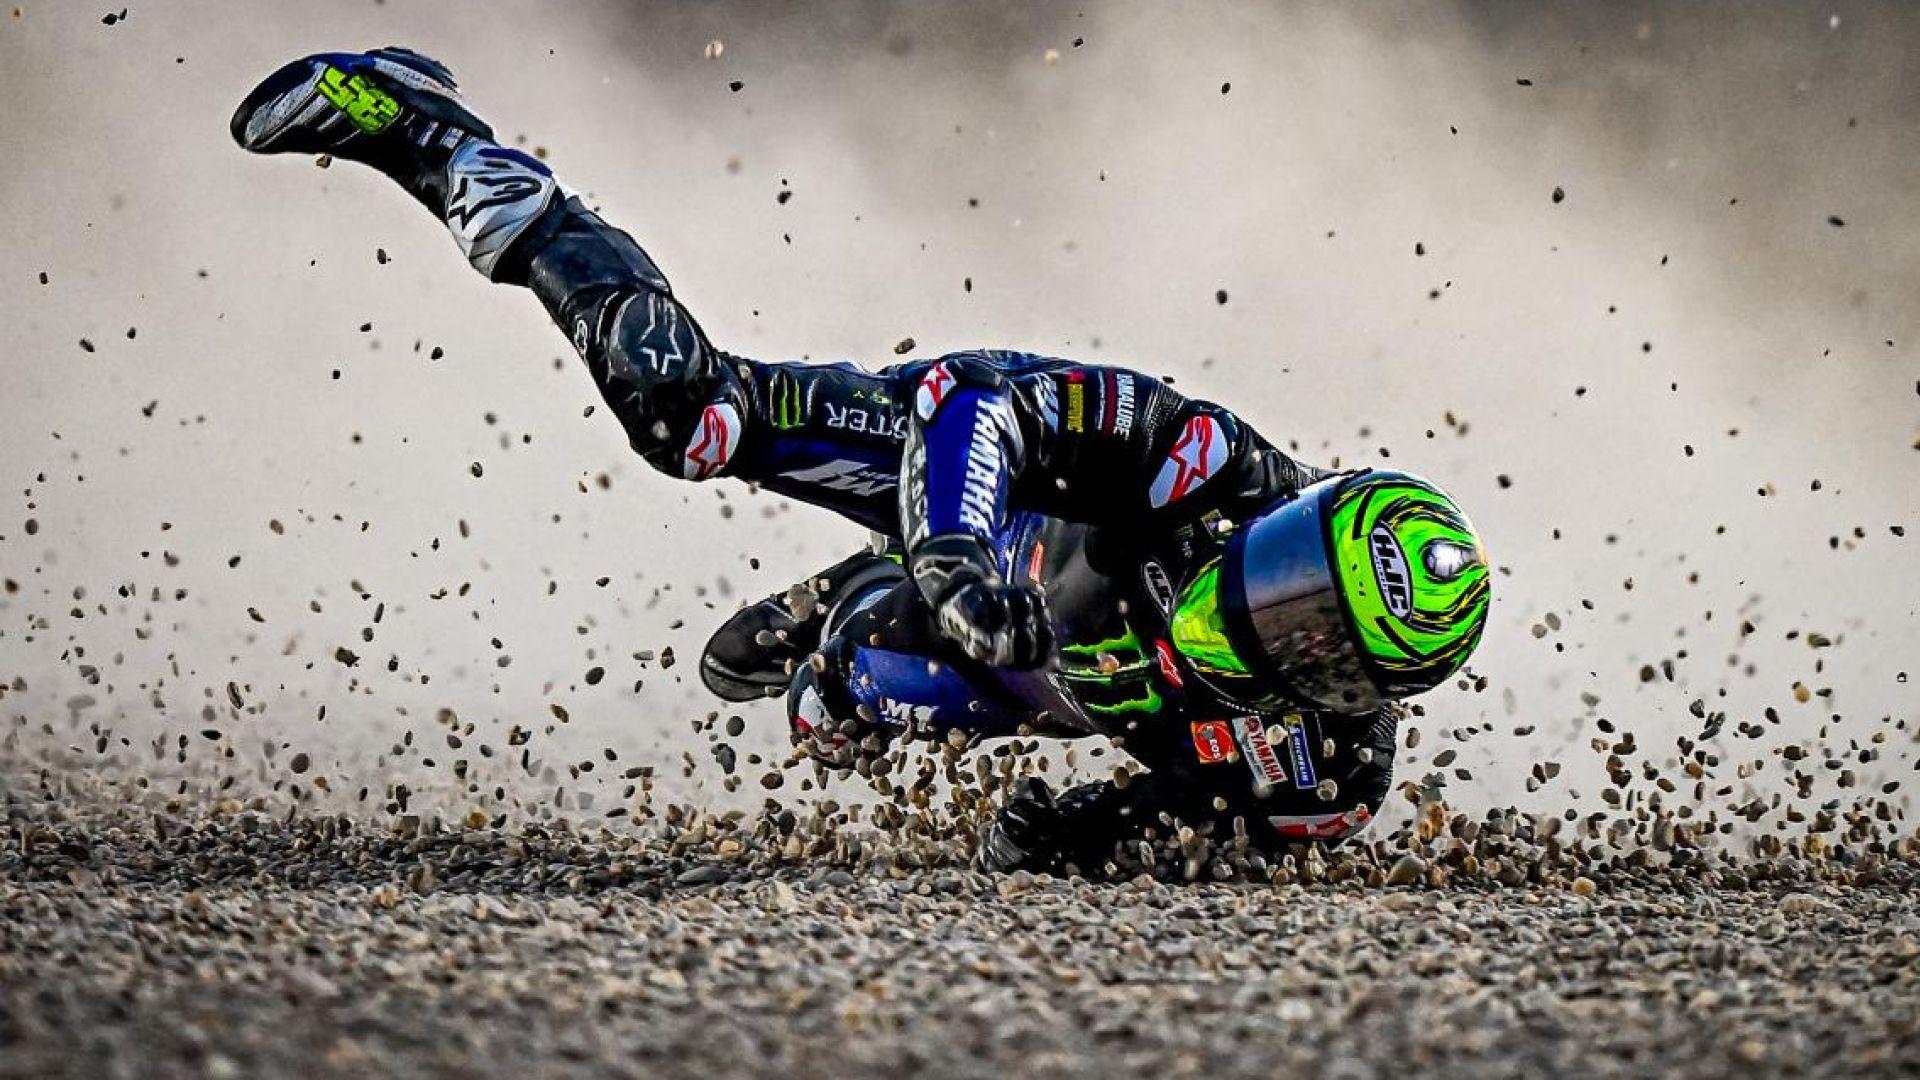 Crutchlow cade, Lorenzo sfotte: baruffa social infiamma i test MotoGP di Losail